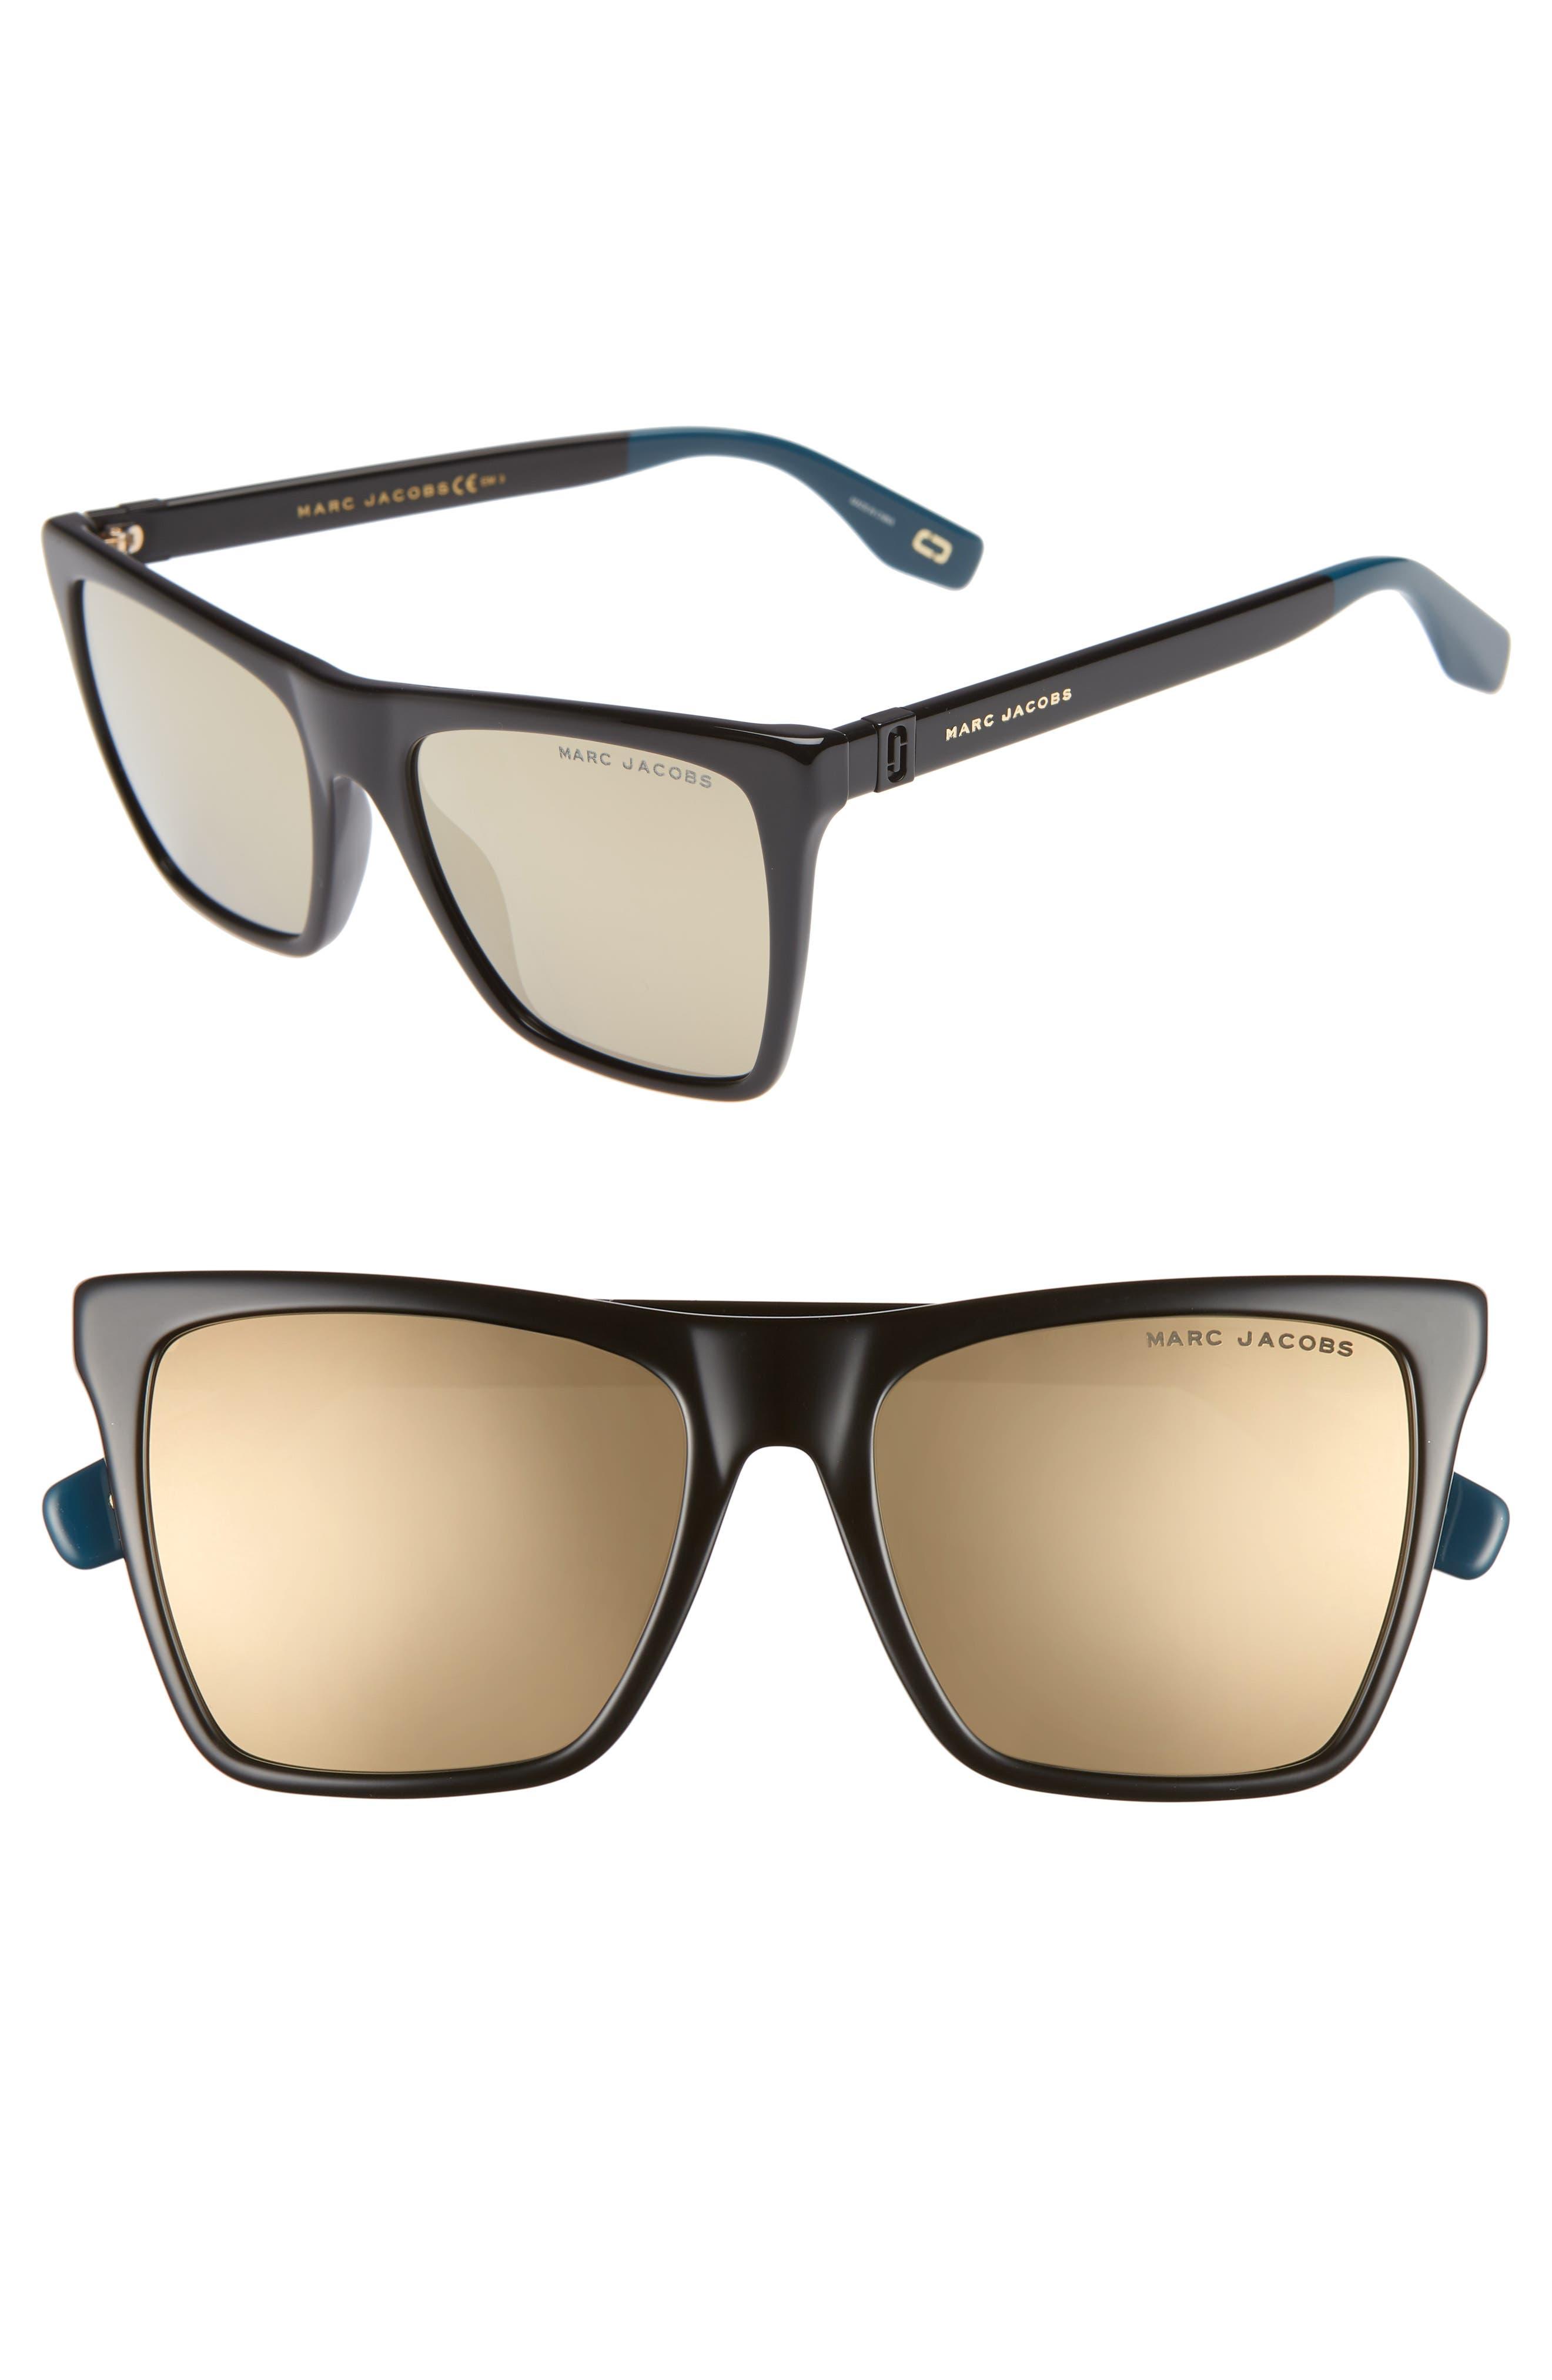 54mm Square Sunglasses,                         Main,                         color, BLACK/ GOLD